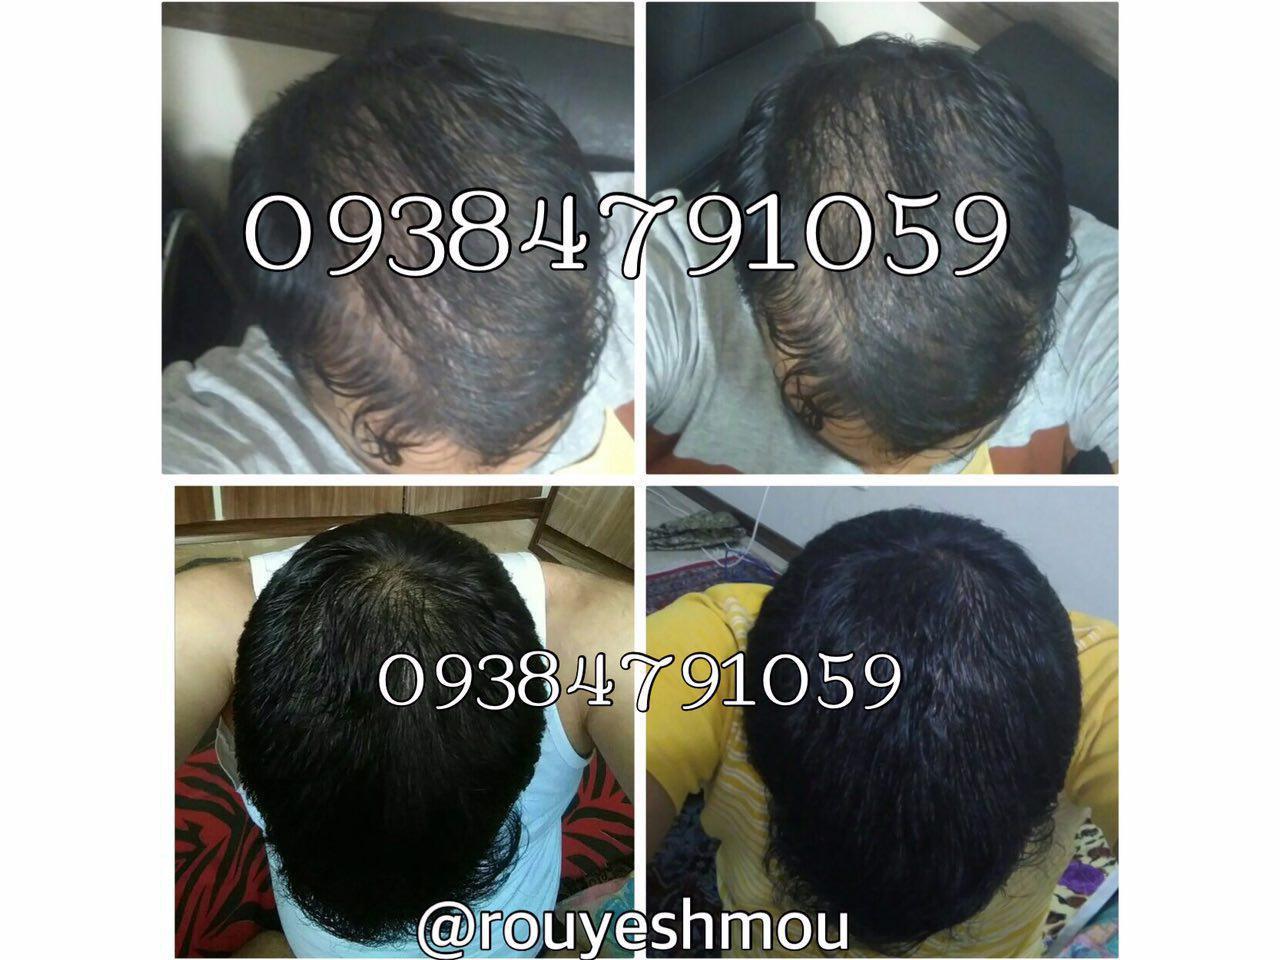 photo 2017 10 27 10 43 06 - روشهای درمان درست ریزش مو